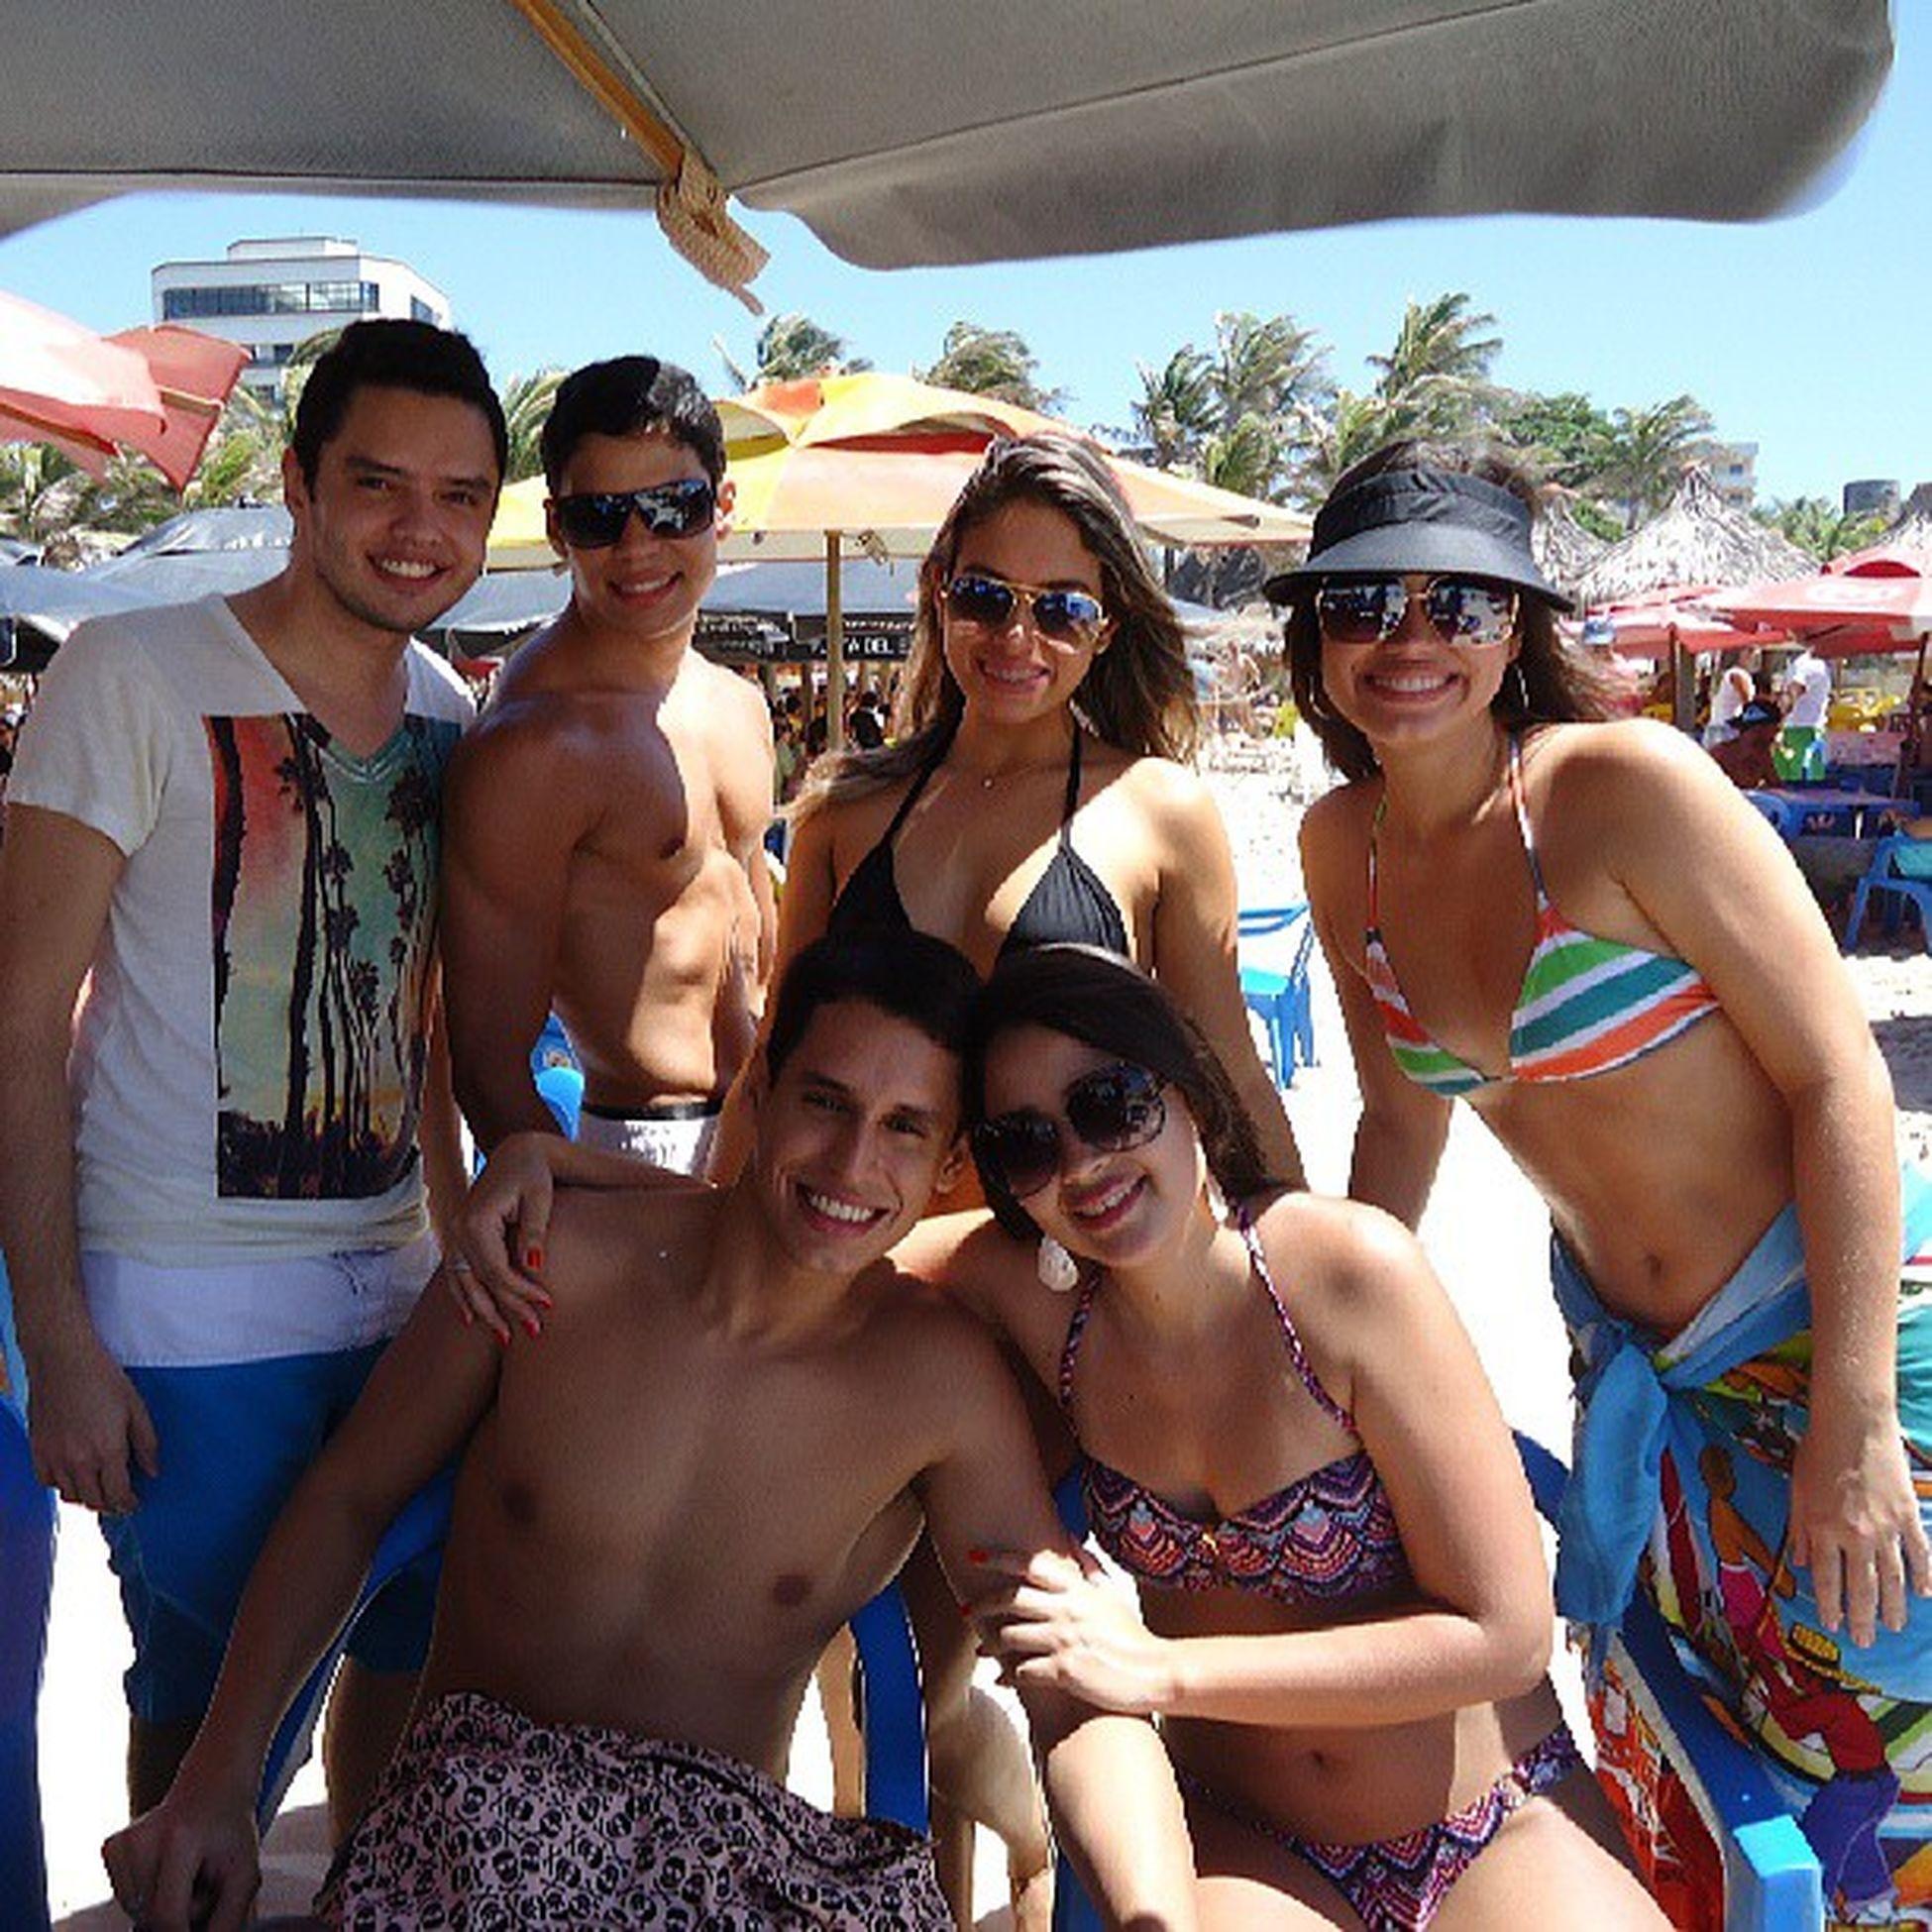 Brilhando em vida, sorrindo à toa. Sun Beach Friends Happy sunglasses love fortaleza